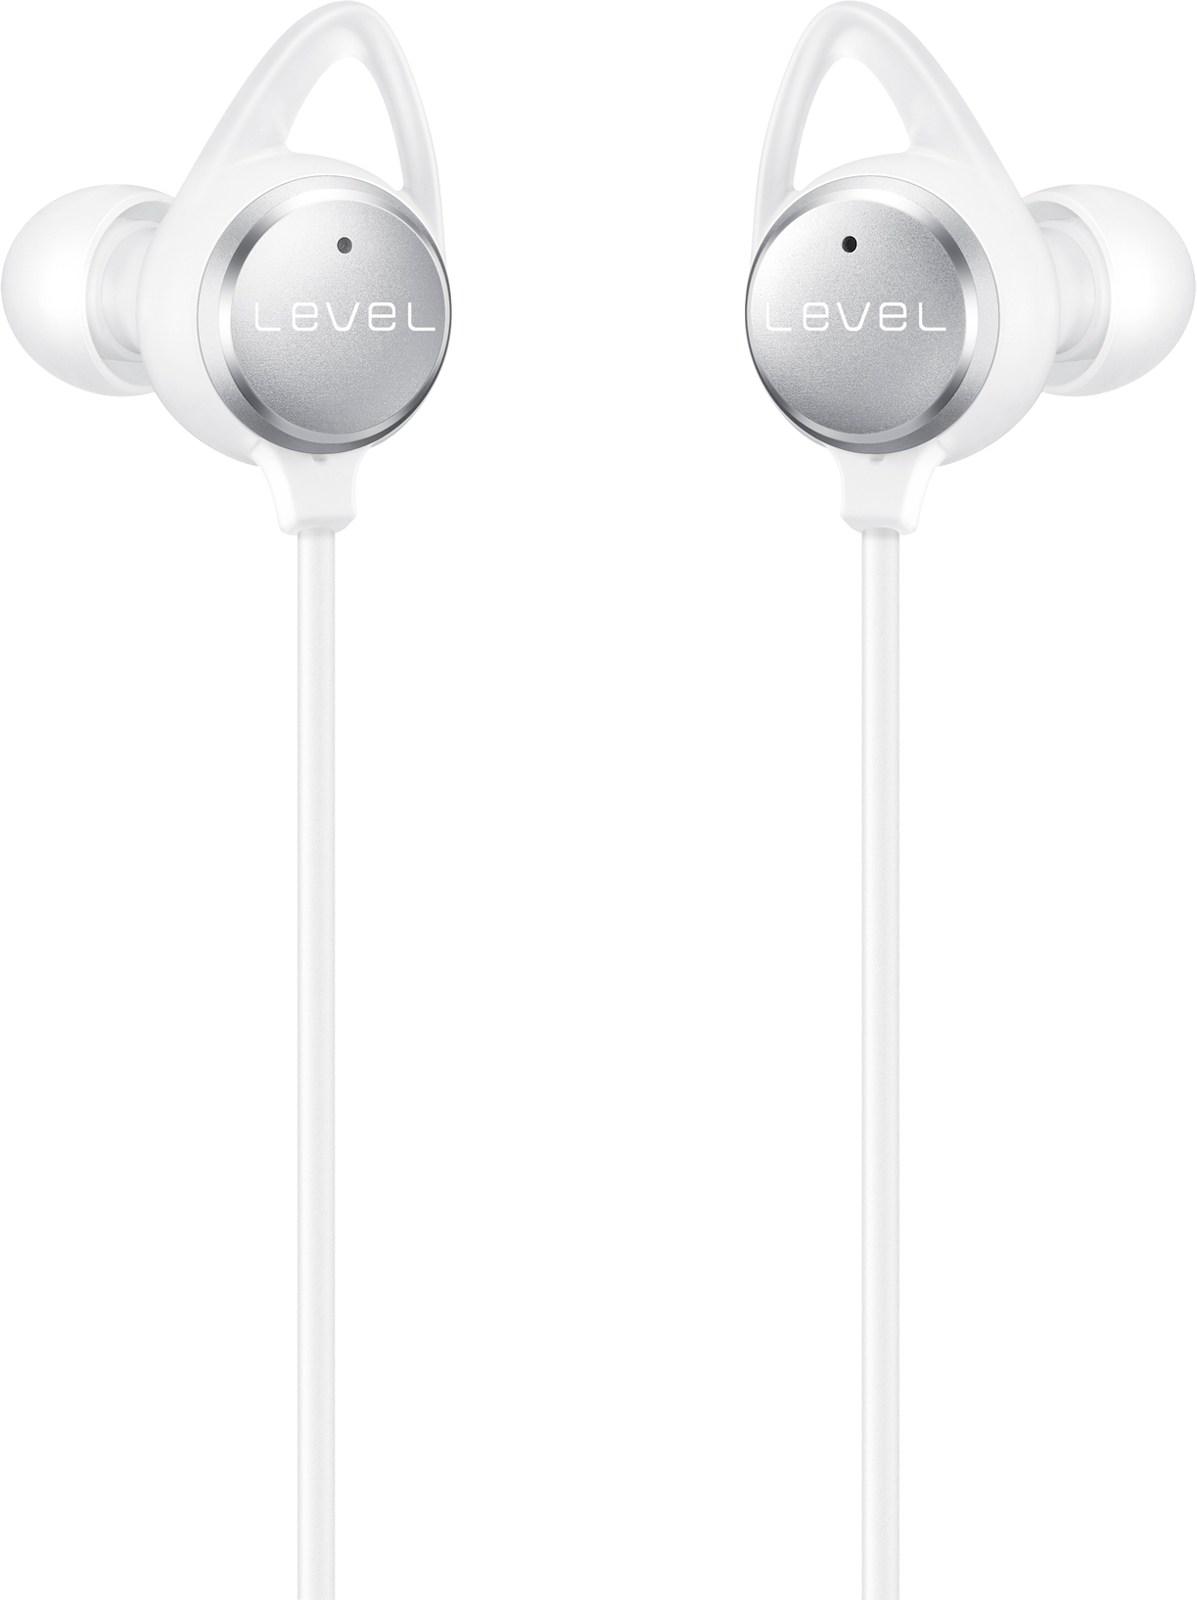 Level In Anc White Headphones